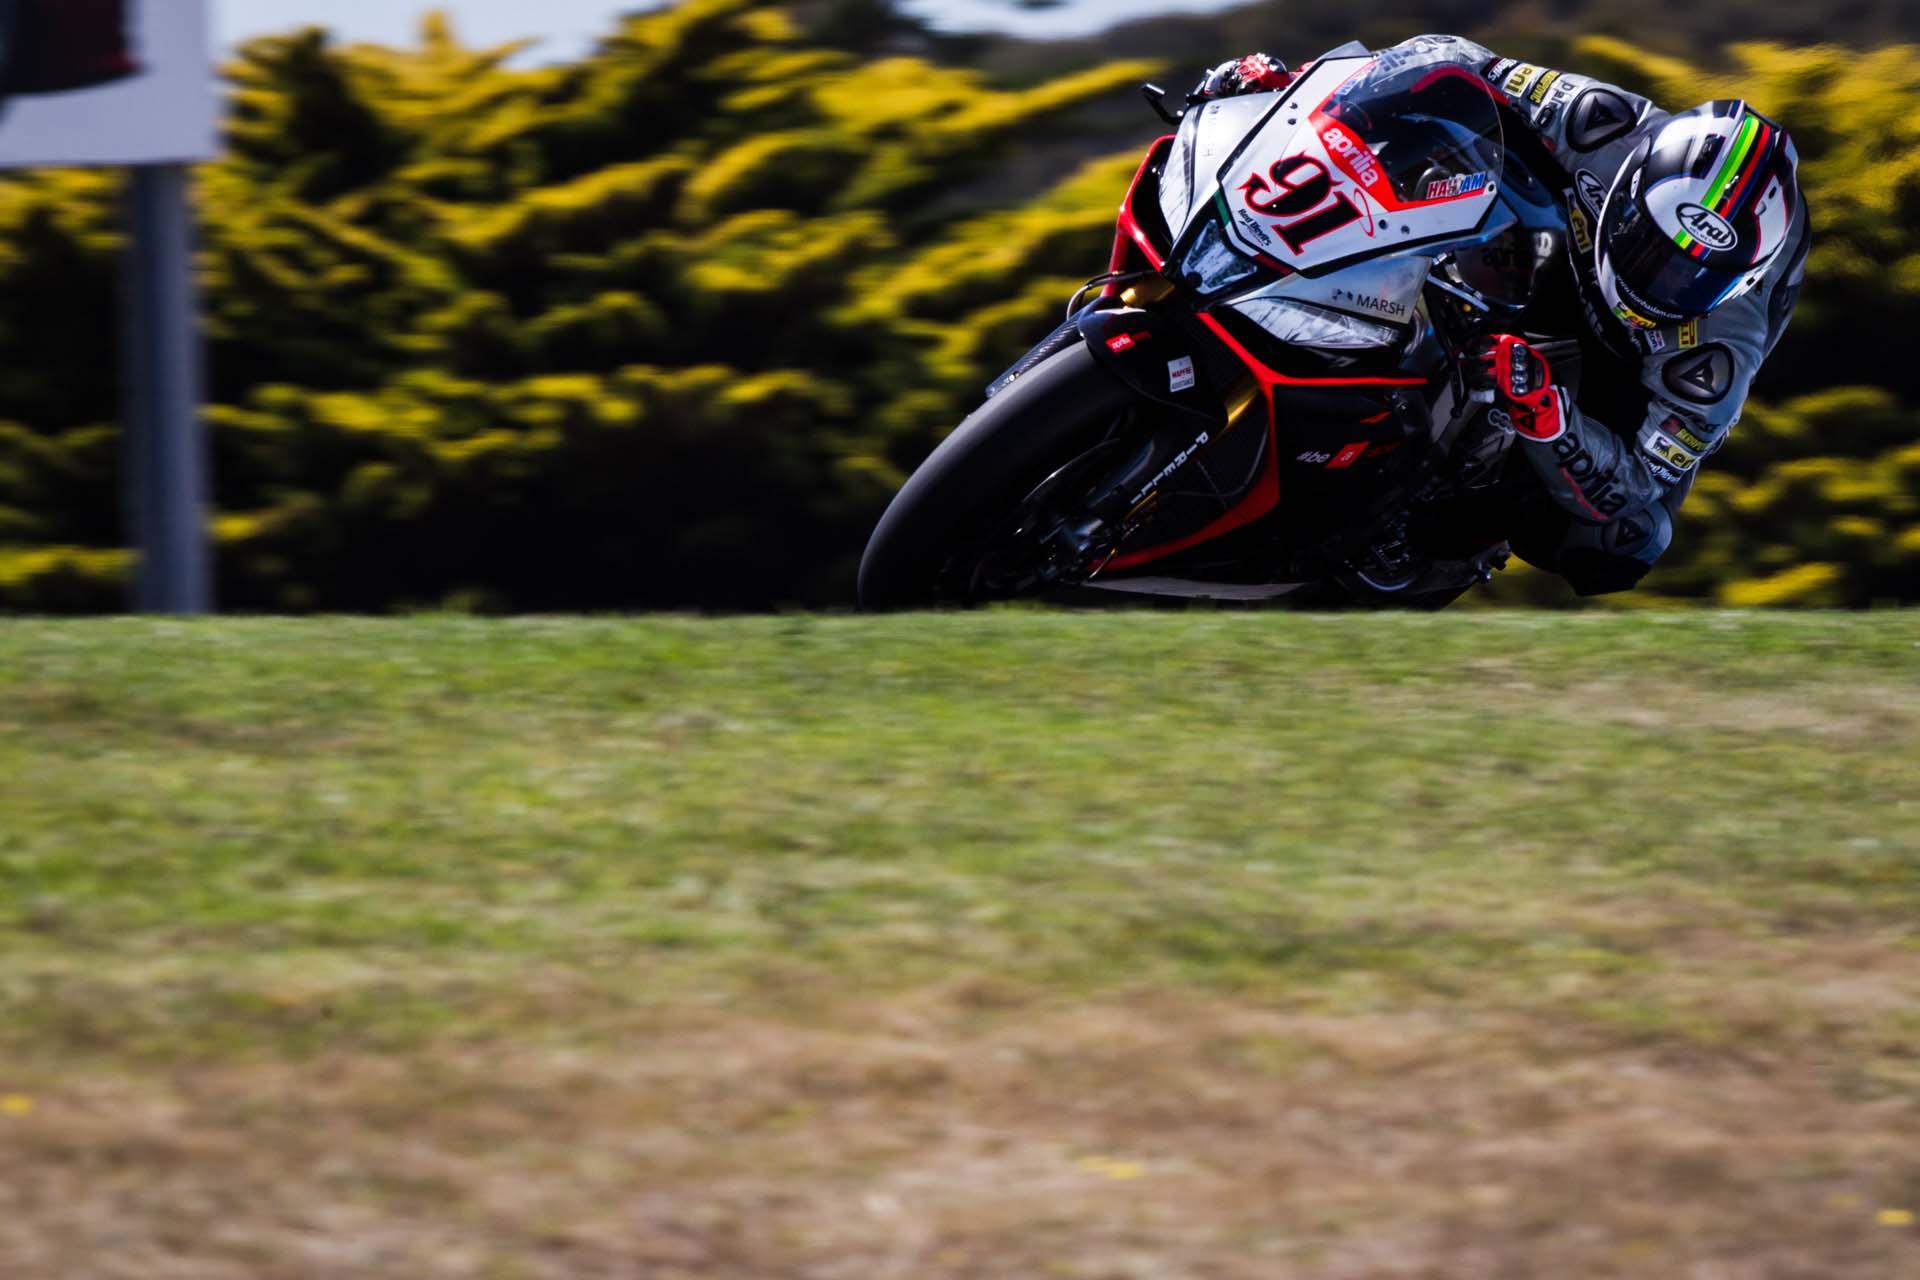 [WSBK] Phillip Island 2015-World-Superbike-Phillip-Island-Anant-Deboor-01